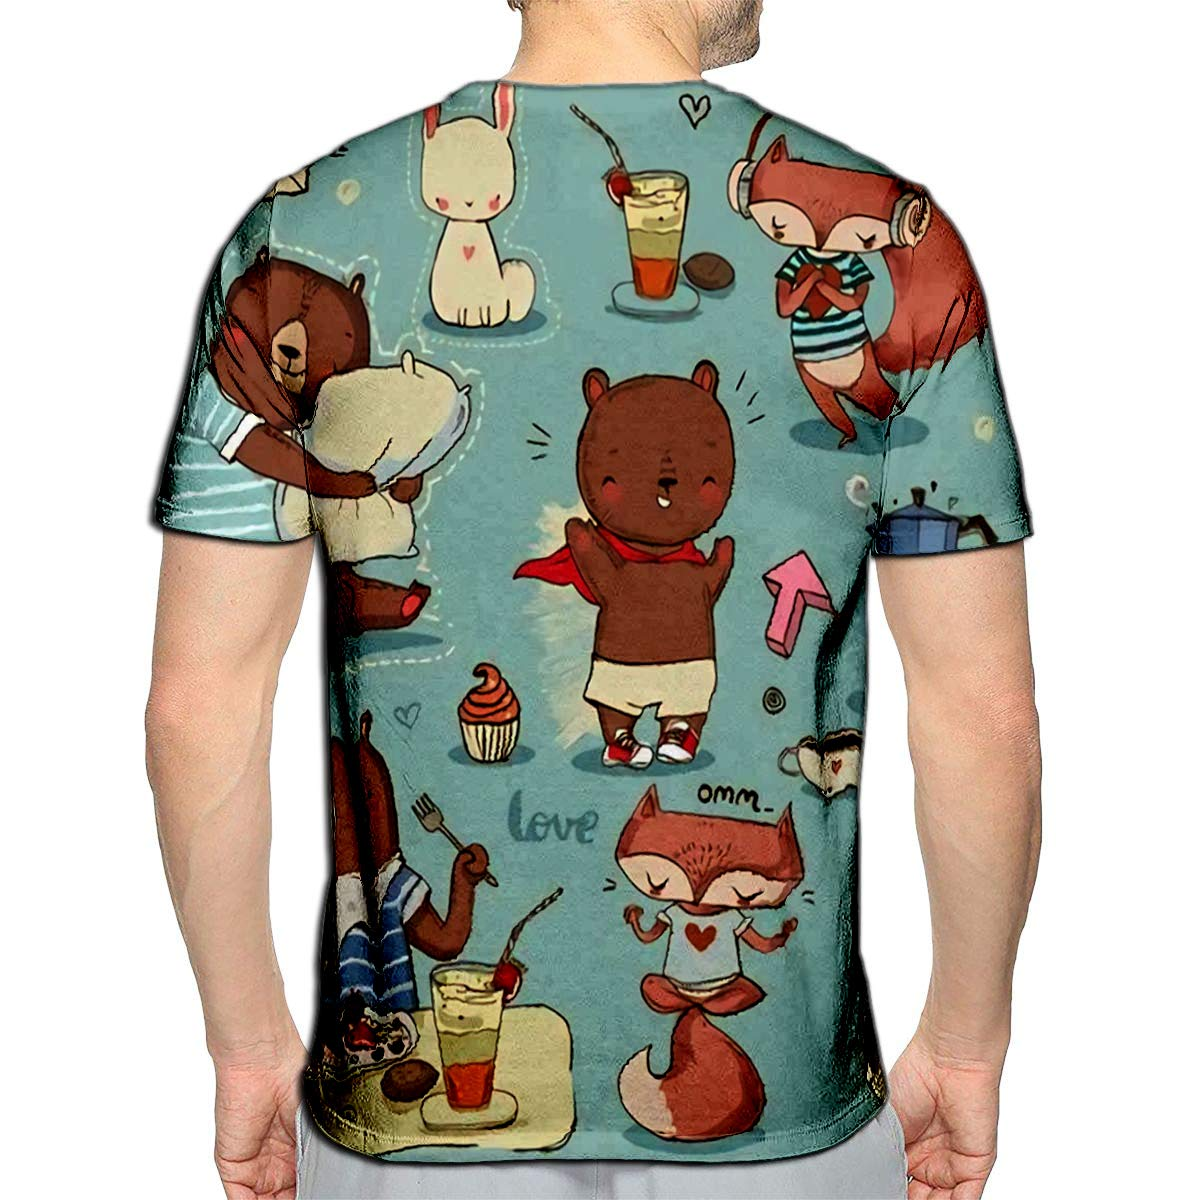 YILINGER 3D Printed T-Shirts Abstract Geometric with Animal Print and Circles Short Sleeve Tops Tees